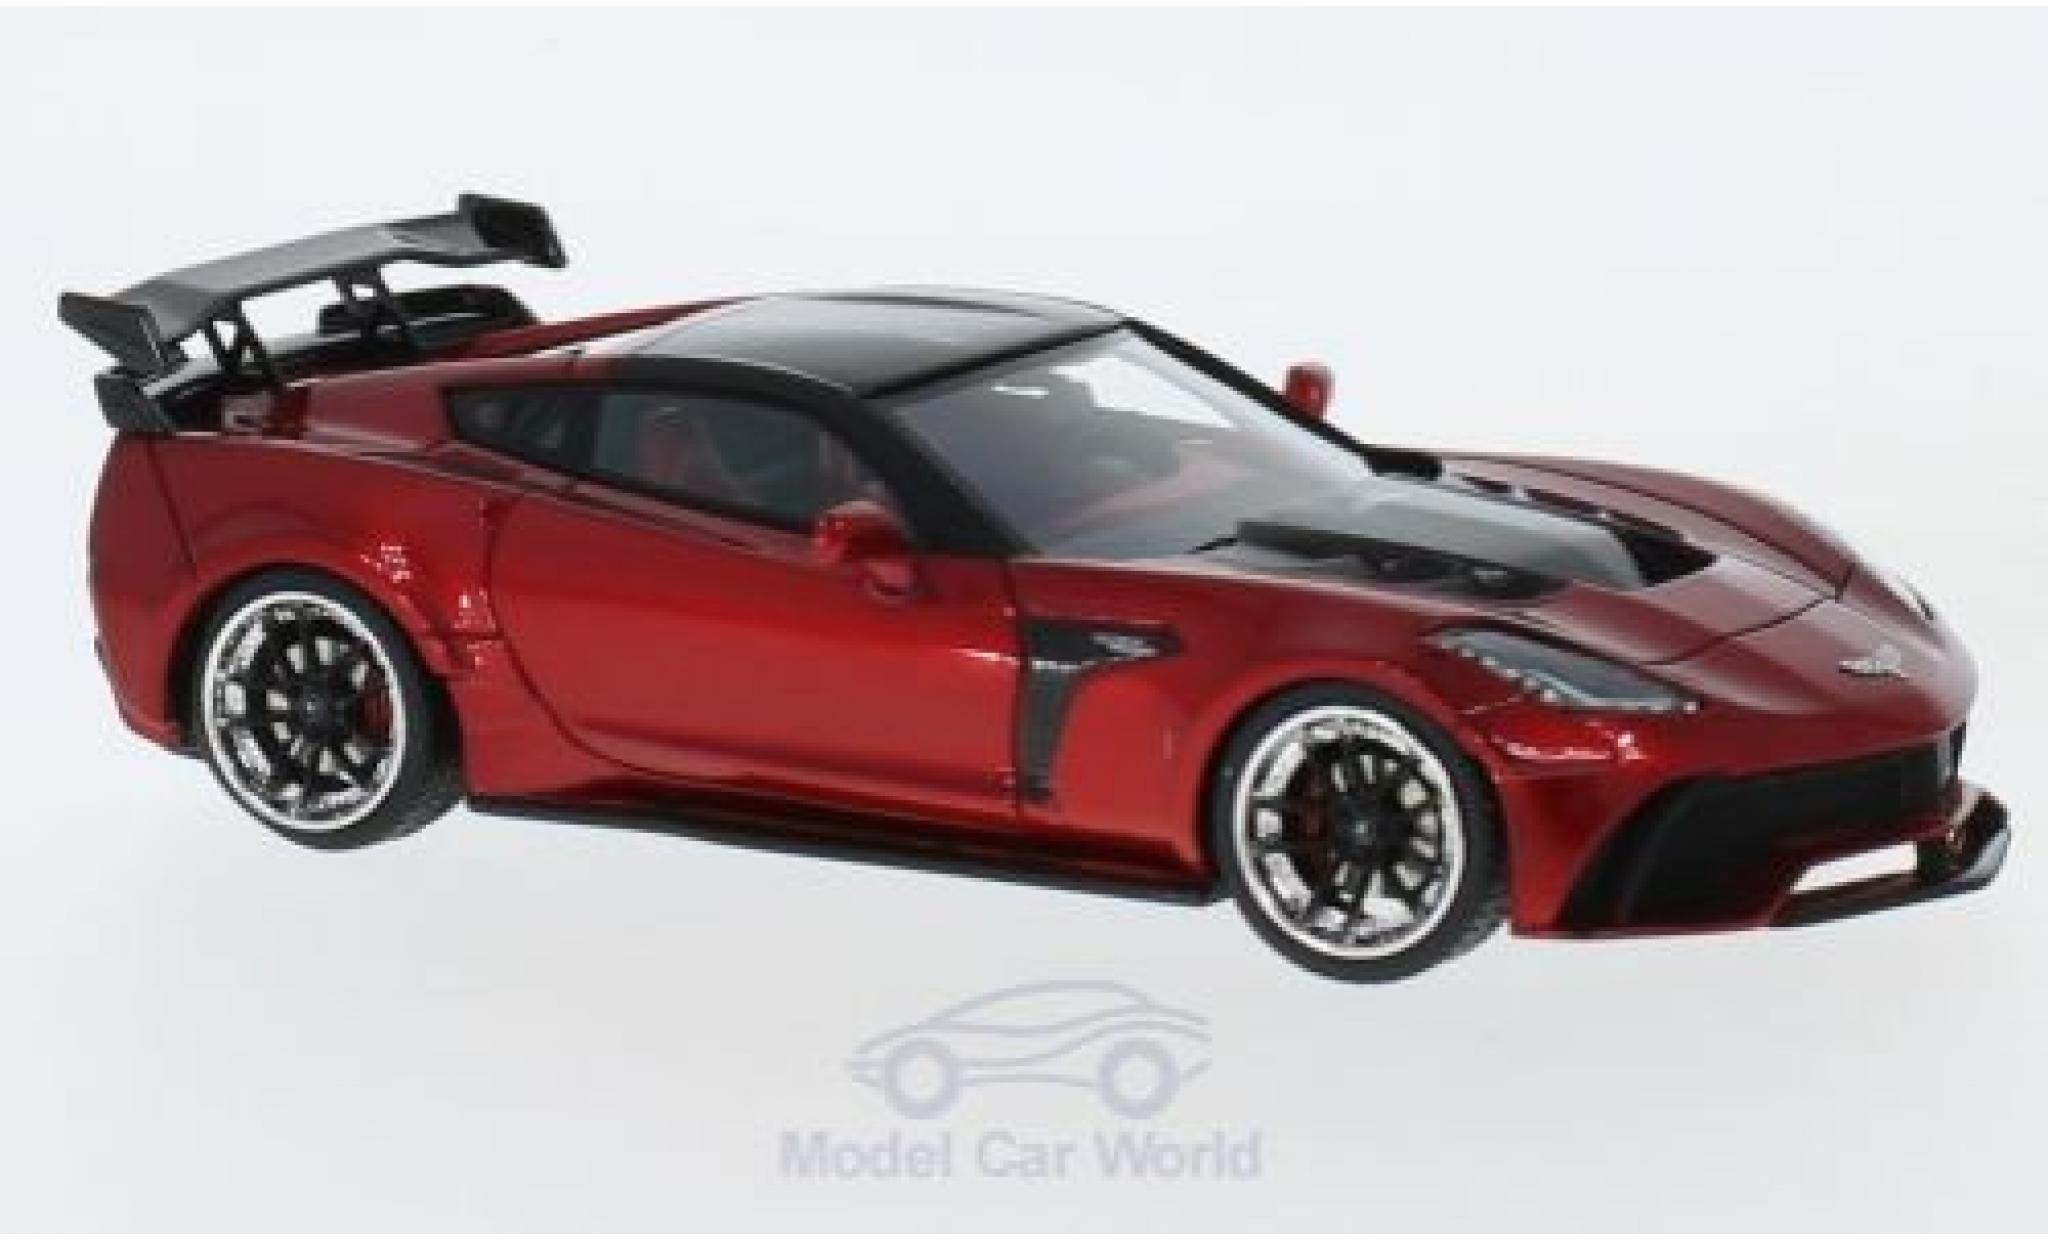 Chevrolet Corvette C7 1/43 GLM Widebody DarwinPRO Black Sails metallise red 2016